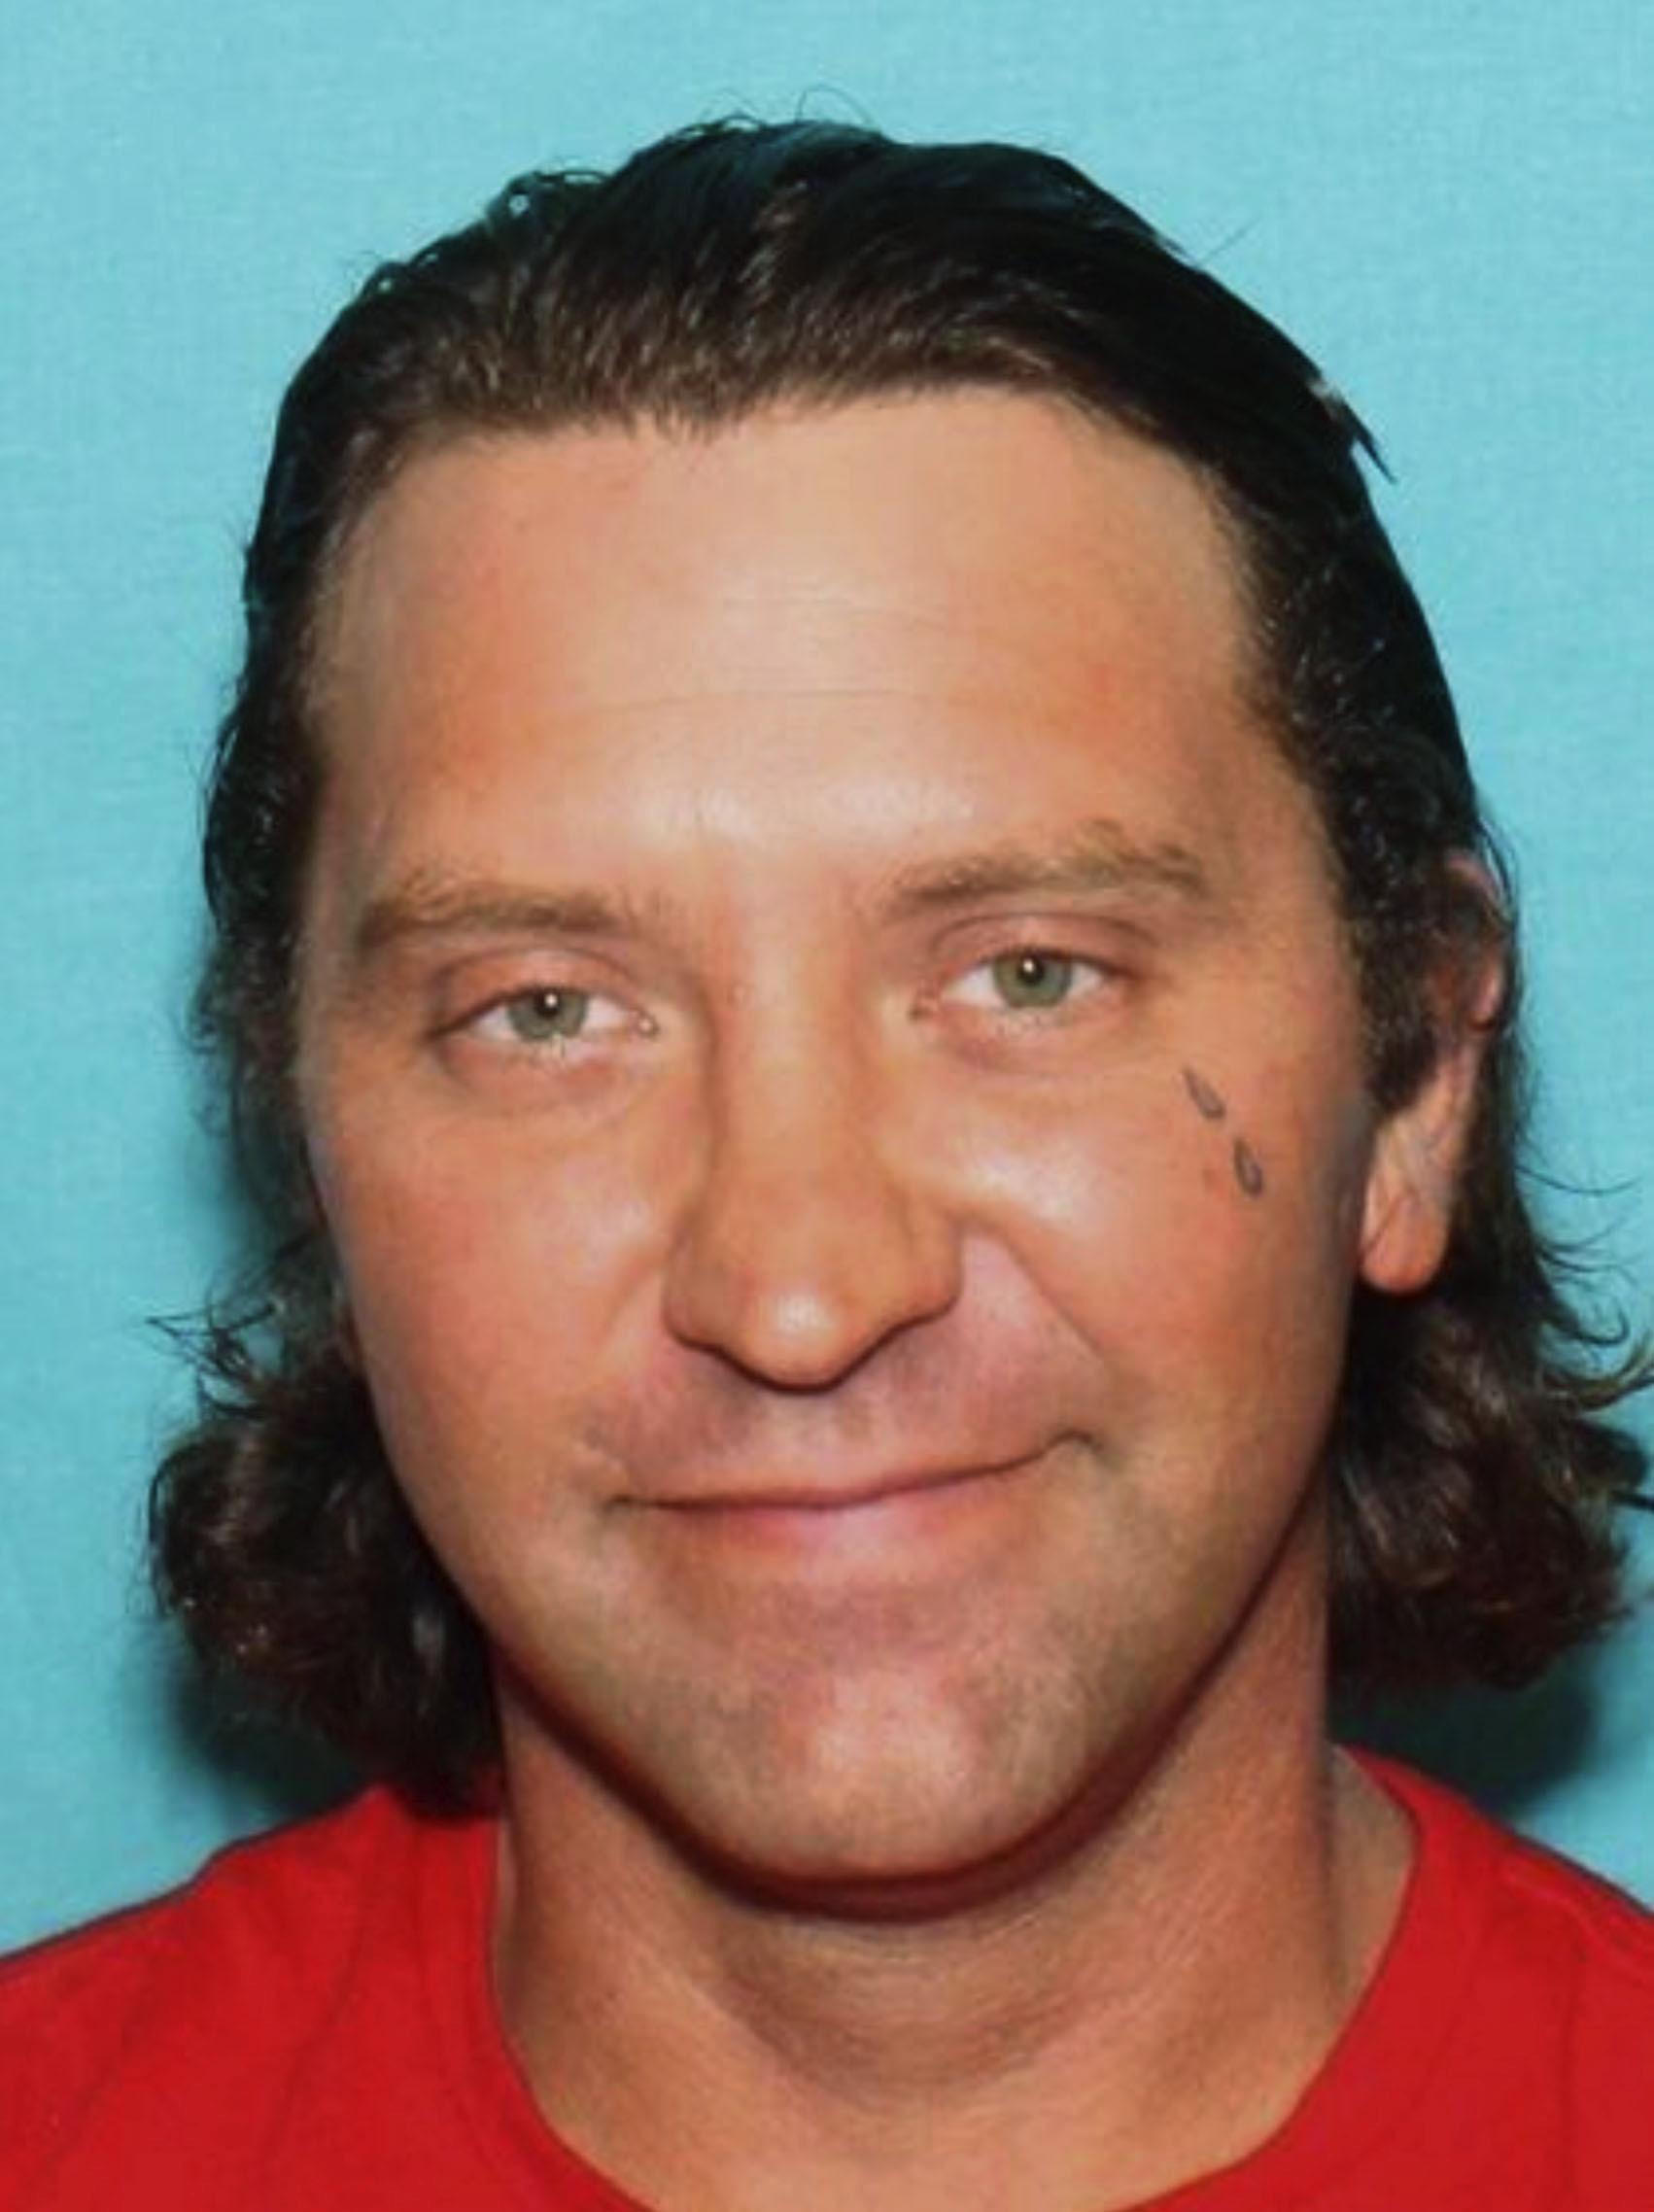 The Latest: Neighbor says gunman was violent, aggressive